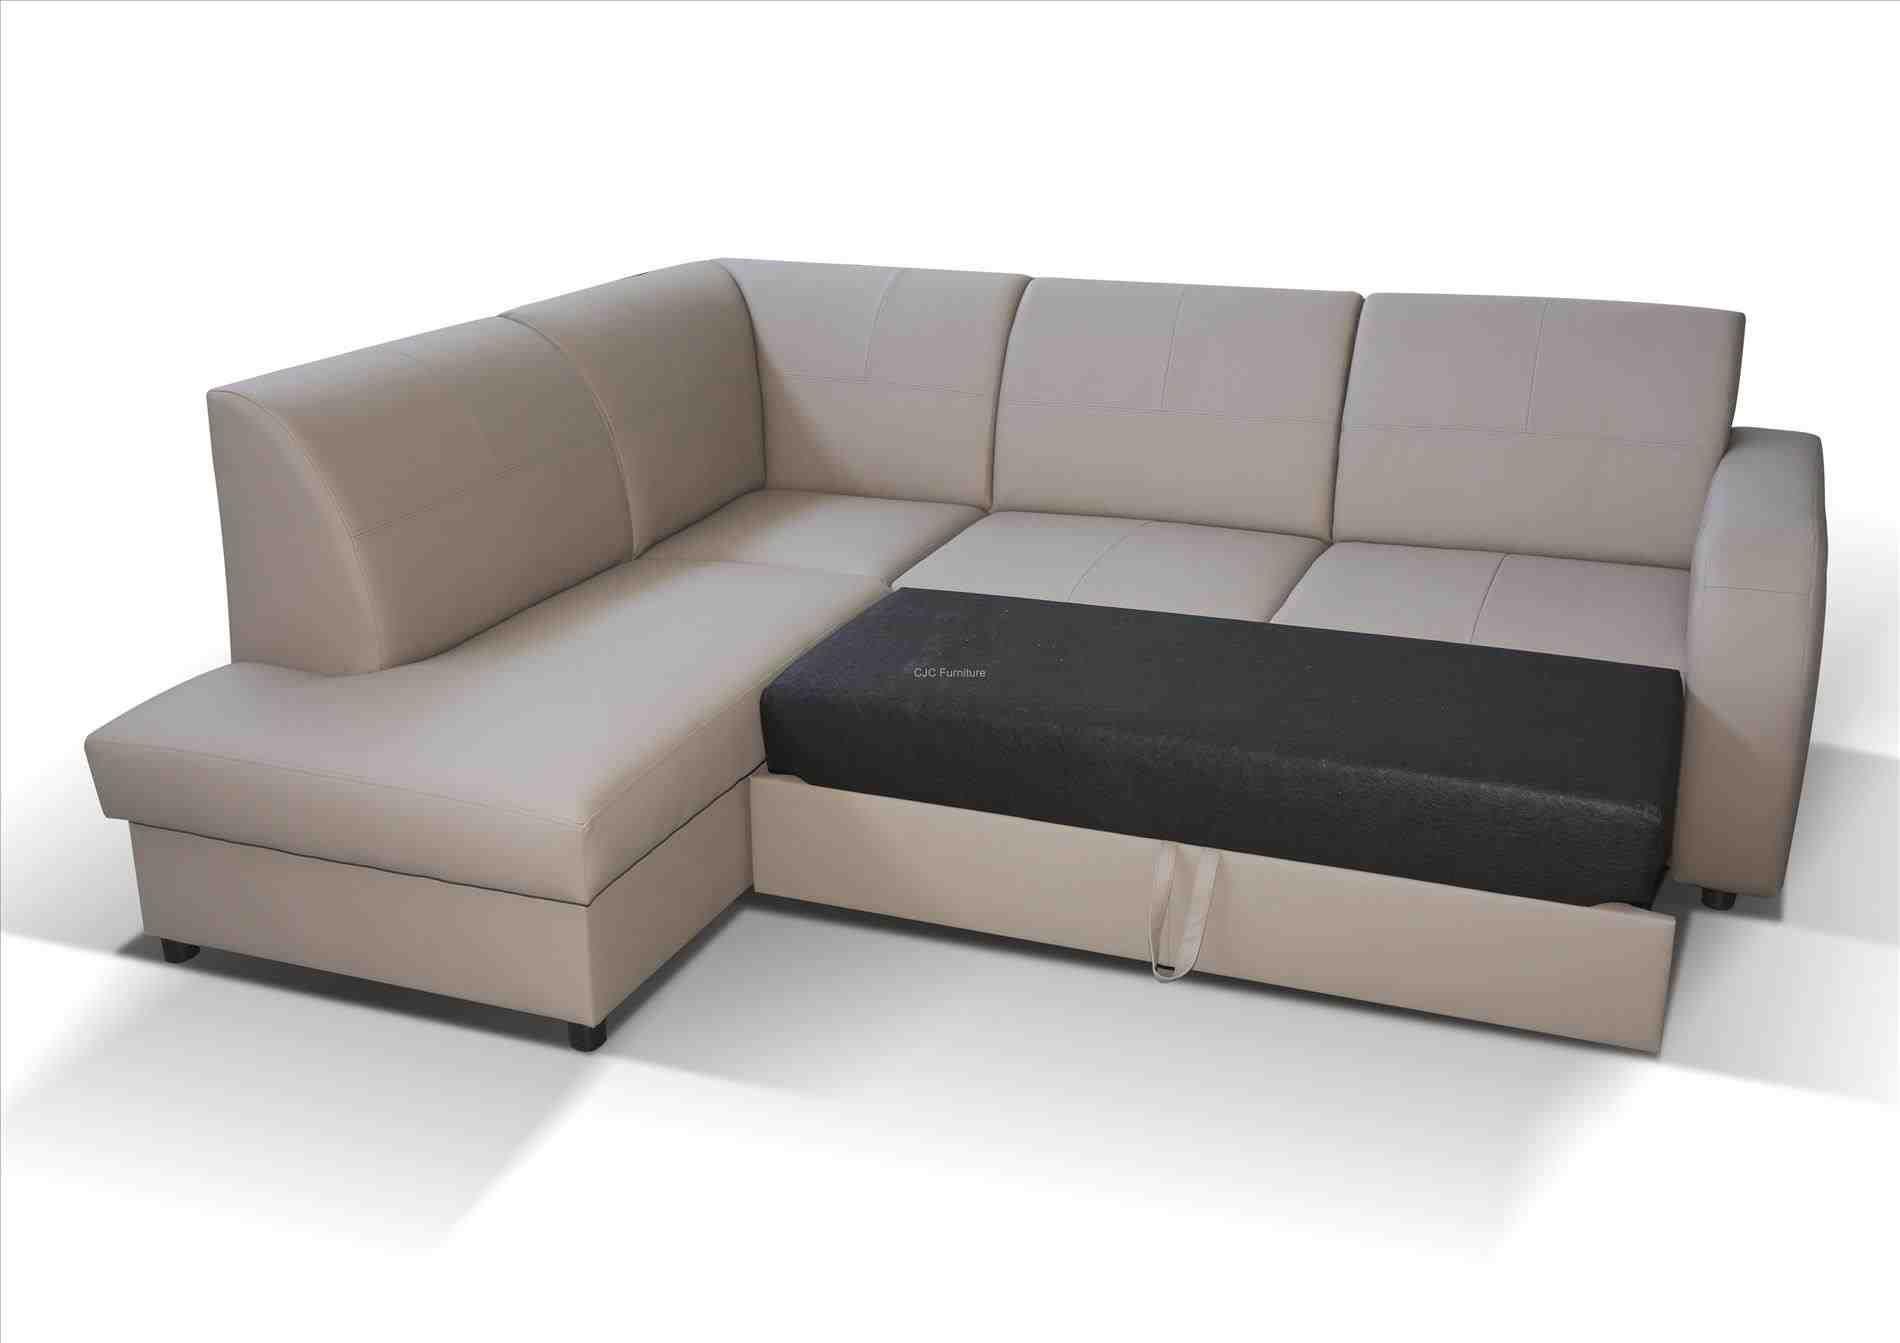 Cheap Sofa Finance Cheap Sofa For Poikilothermia Info Finance On Sofas For Bad Credit Sofa Corner Sofa Comfortable Sofa Bed Comfortable Sofa Sofa Furniture